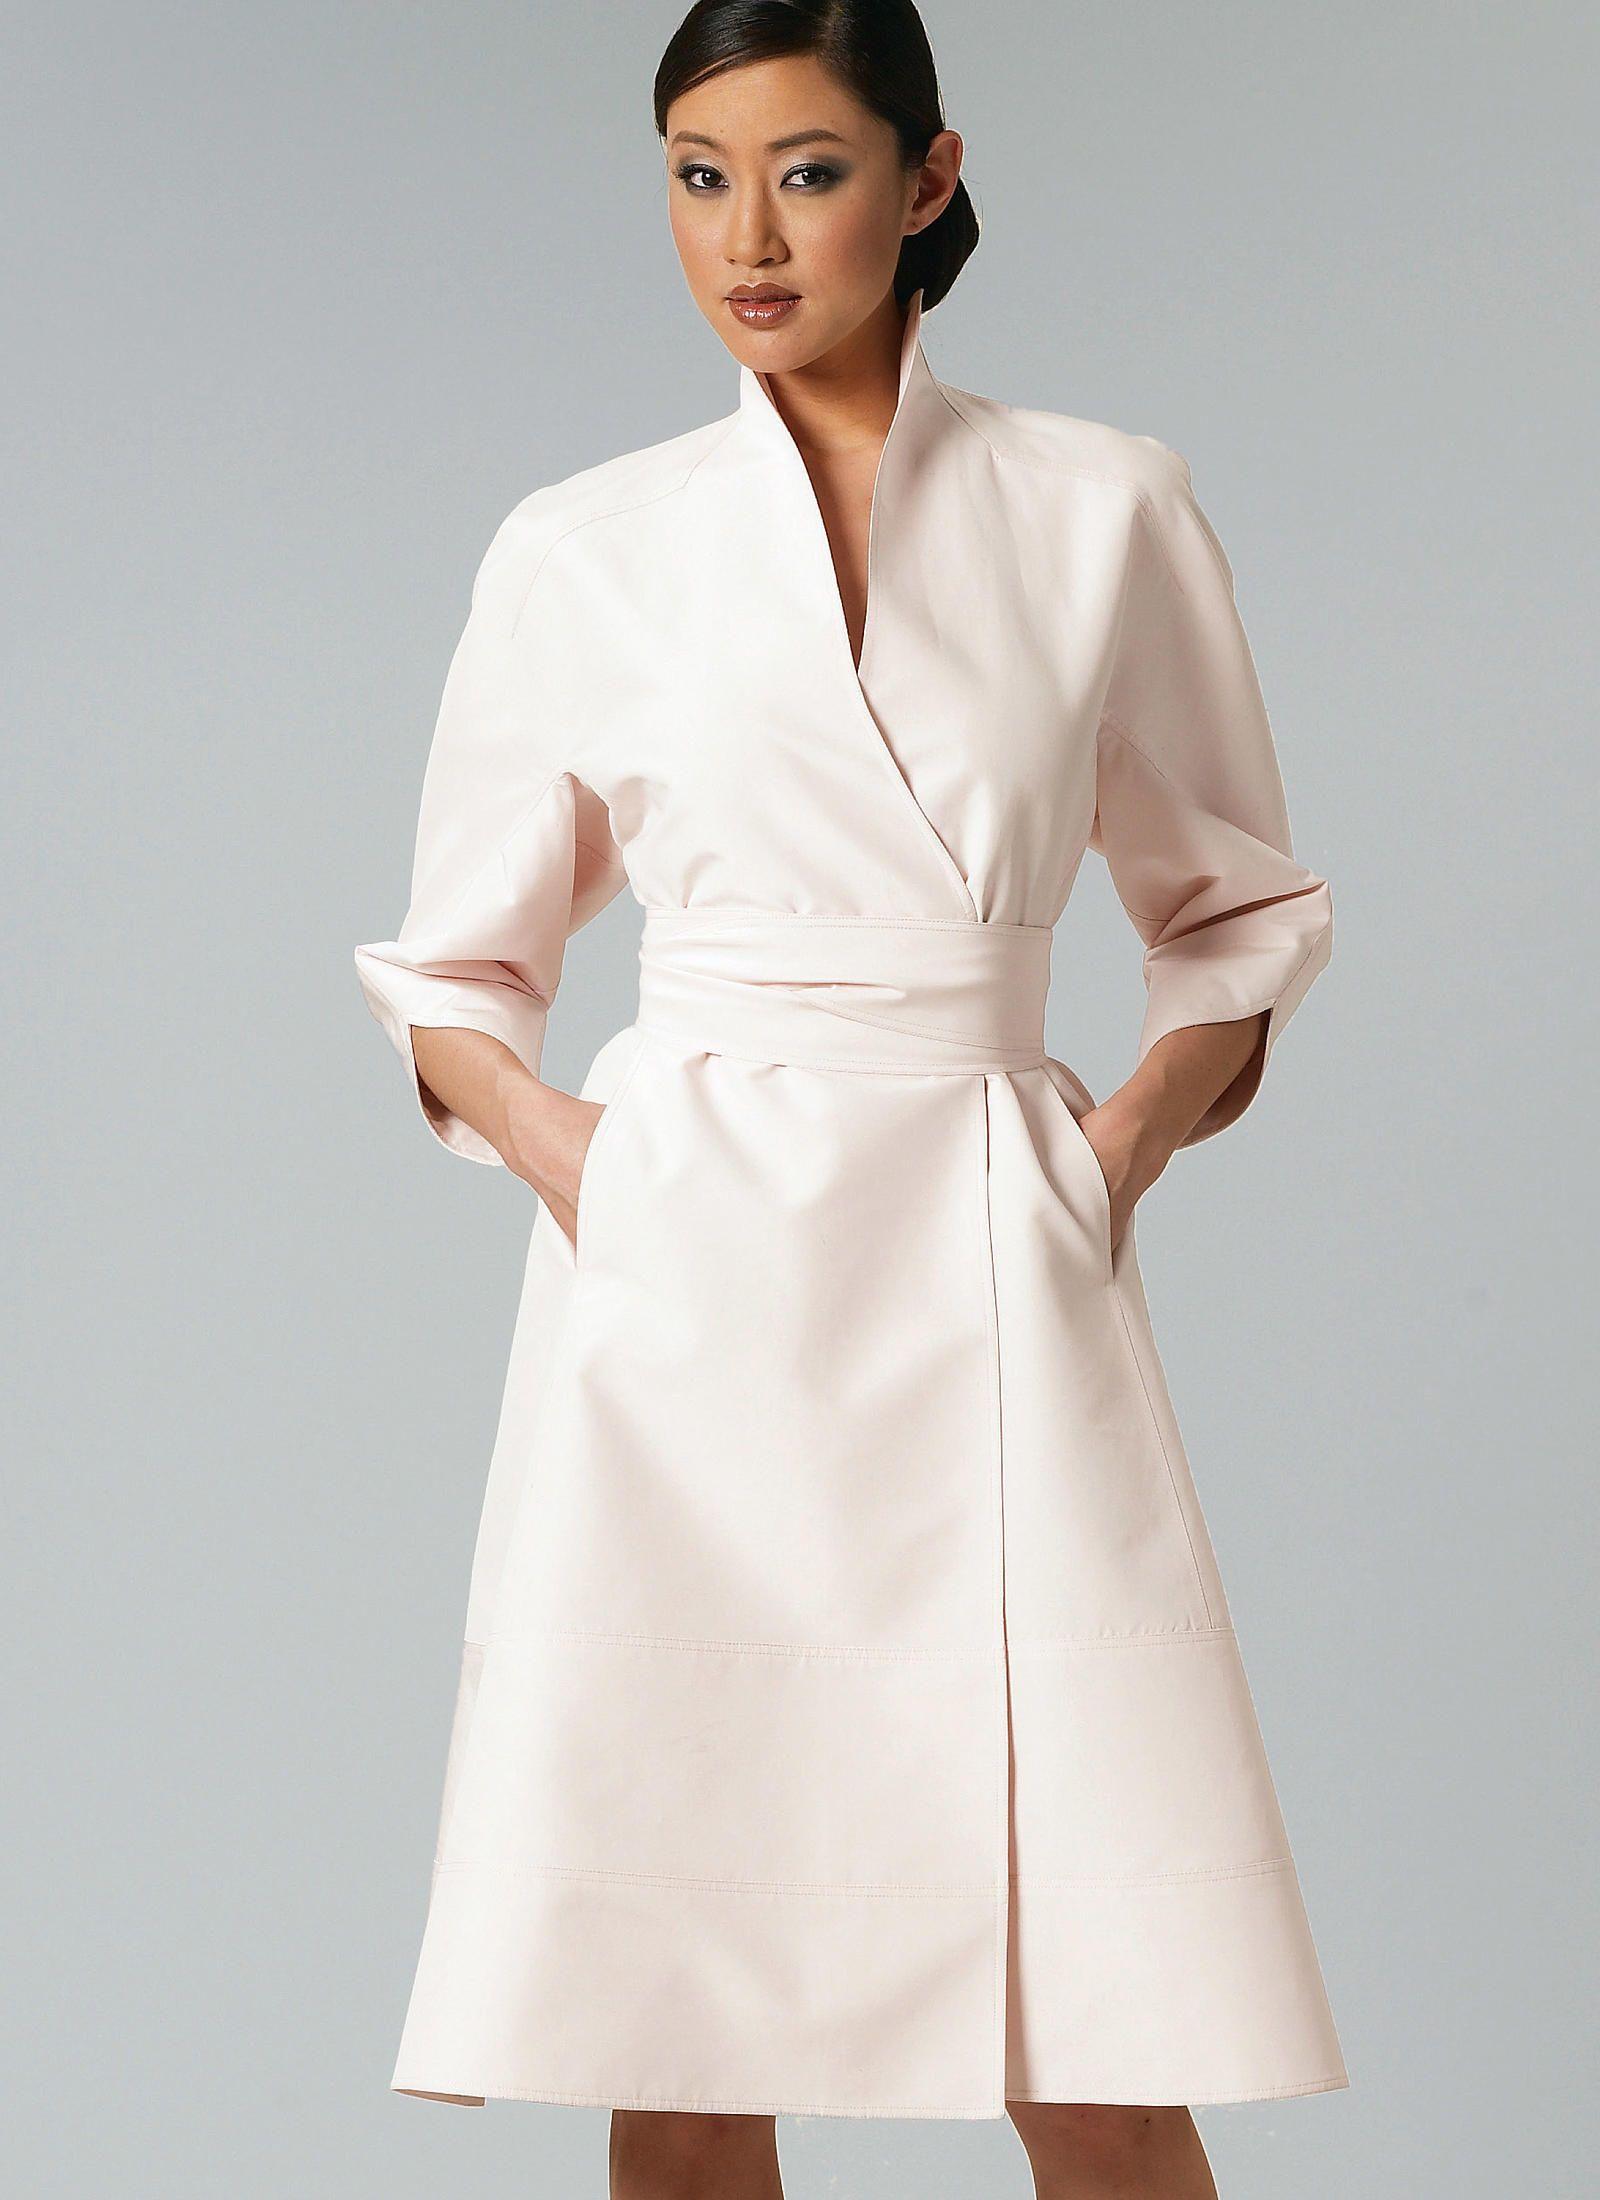 V1239 | Vogue Patterns | Sewing Patterns | Fashion | Pinterest ...